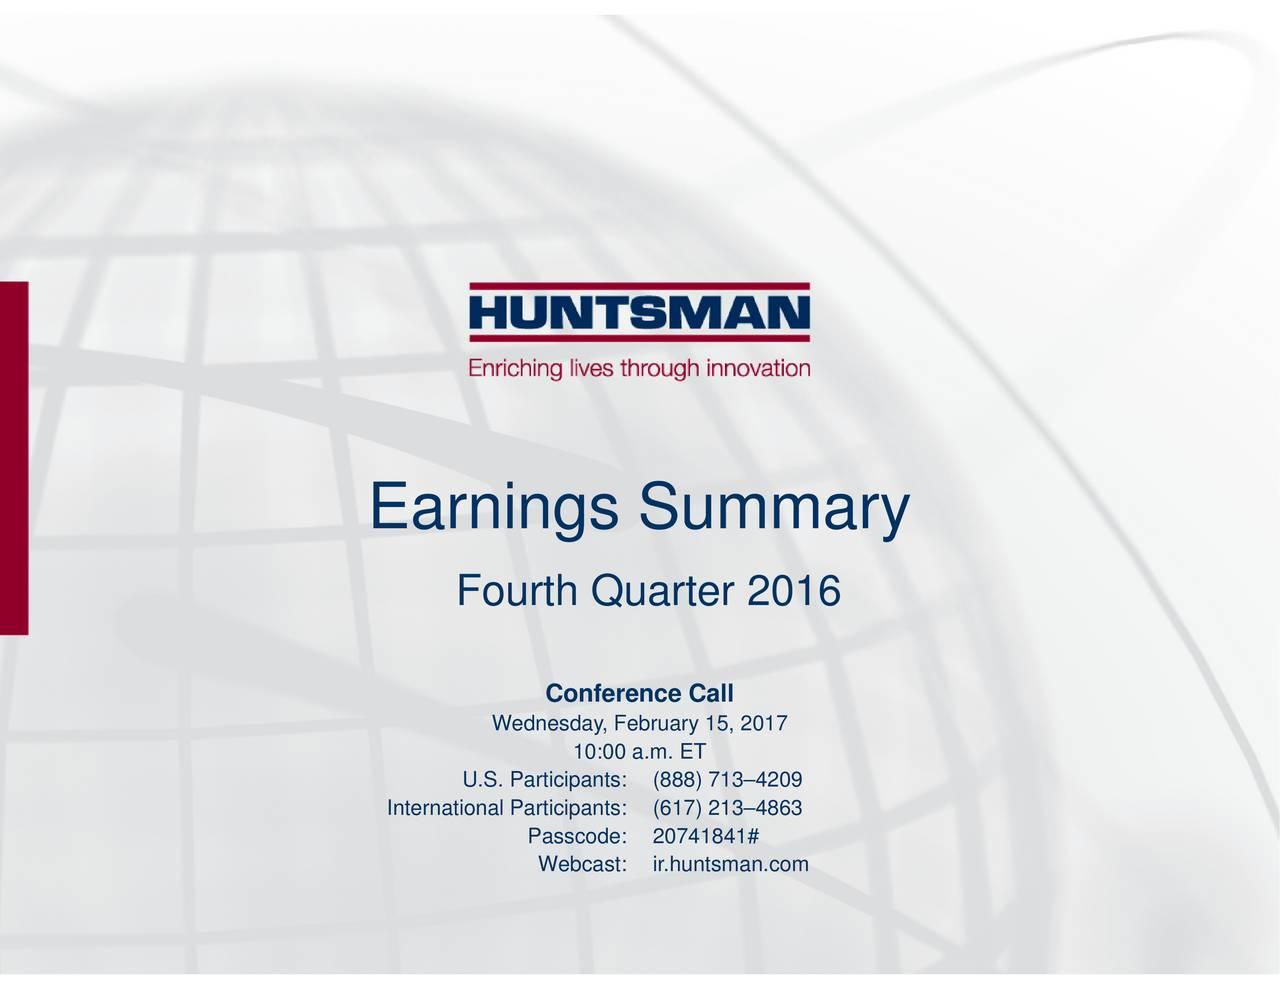 Conference CaWebcast: ir.huntsman.com Passcode: 20741841# Wednesday, February 15, 2017 U.S. Participan(888) 7134209 Fourth Quarter 2016 International Partici(617) 2134863 Earnings Summary